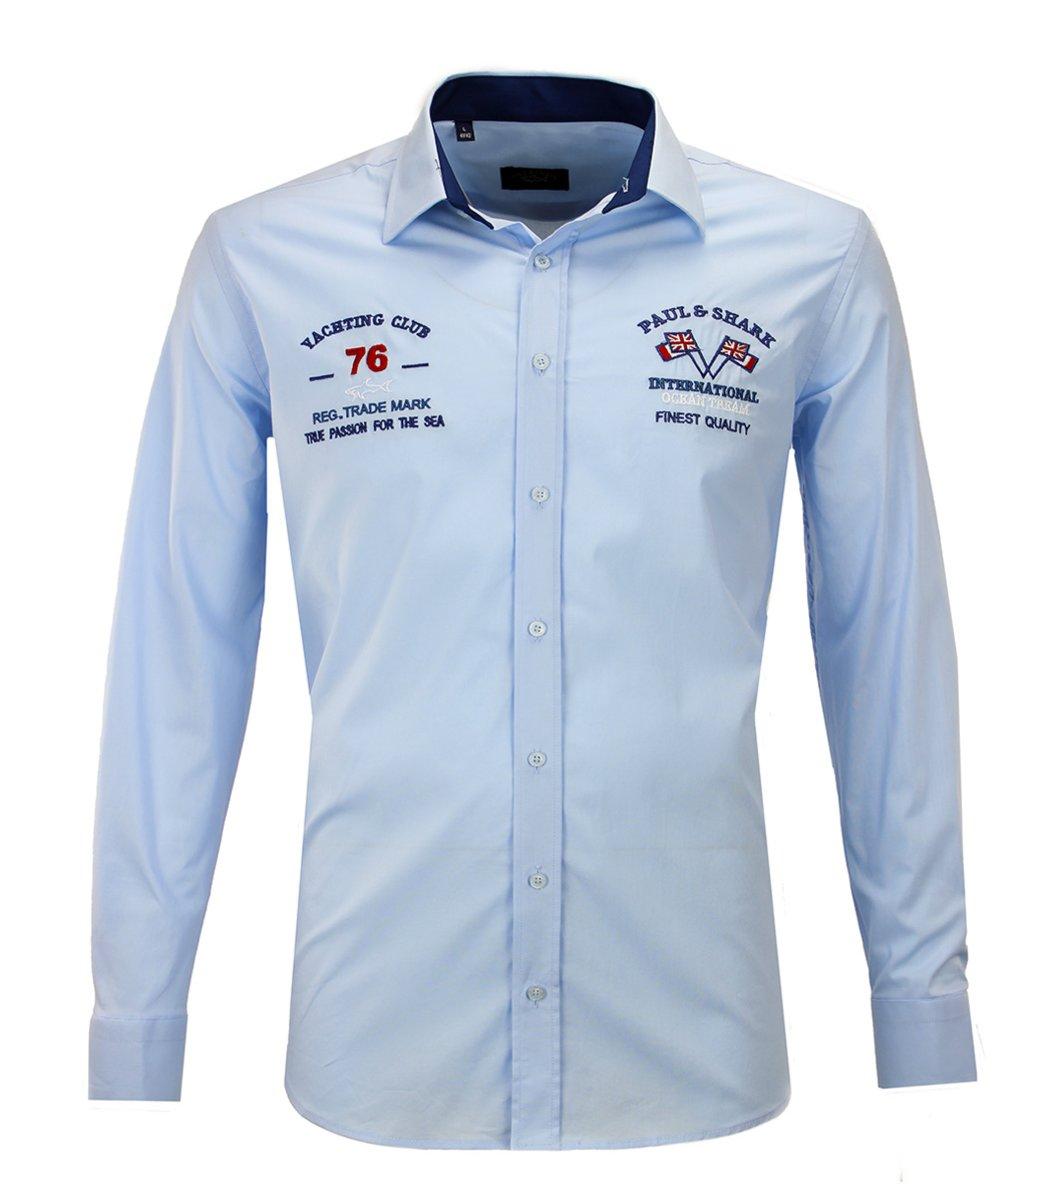 Голубая рубашка Paul&Shark 76 RP1 - Голубой - Вид 1